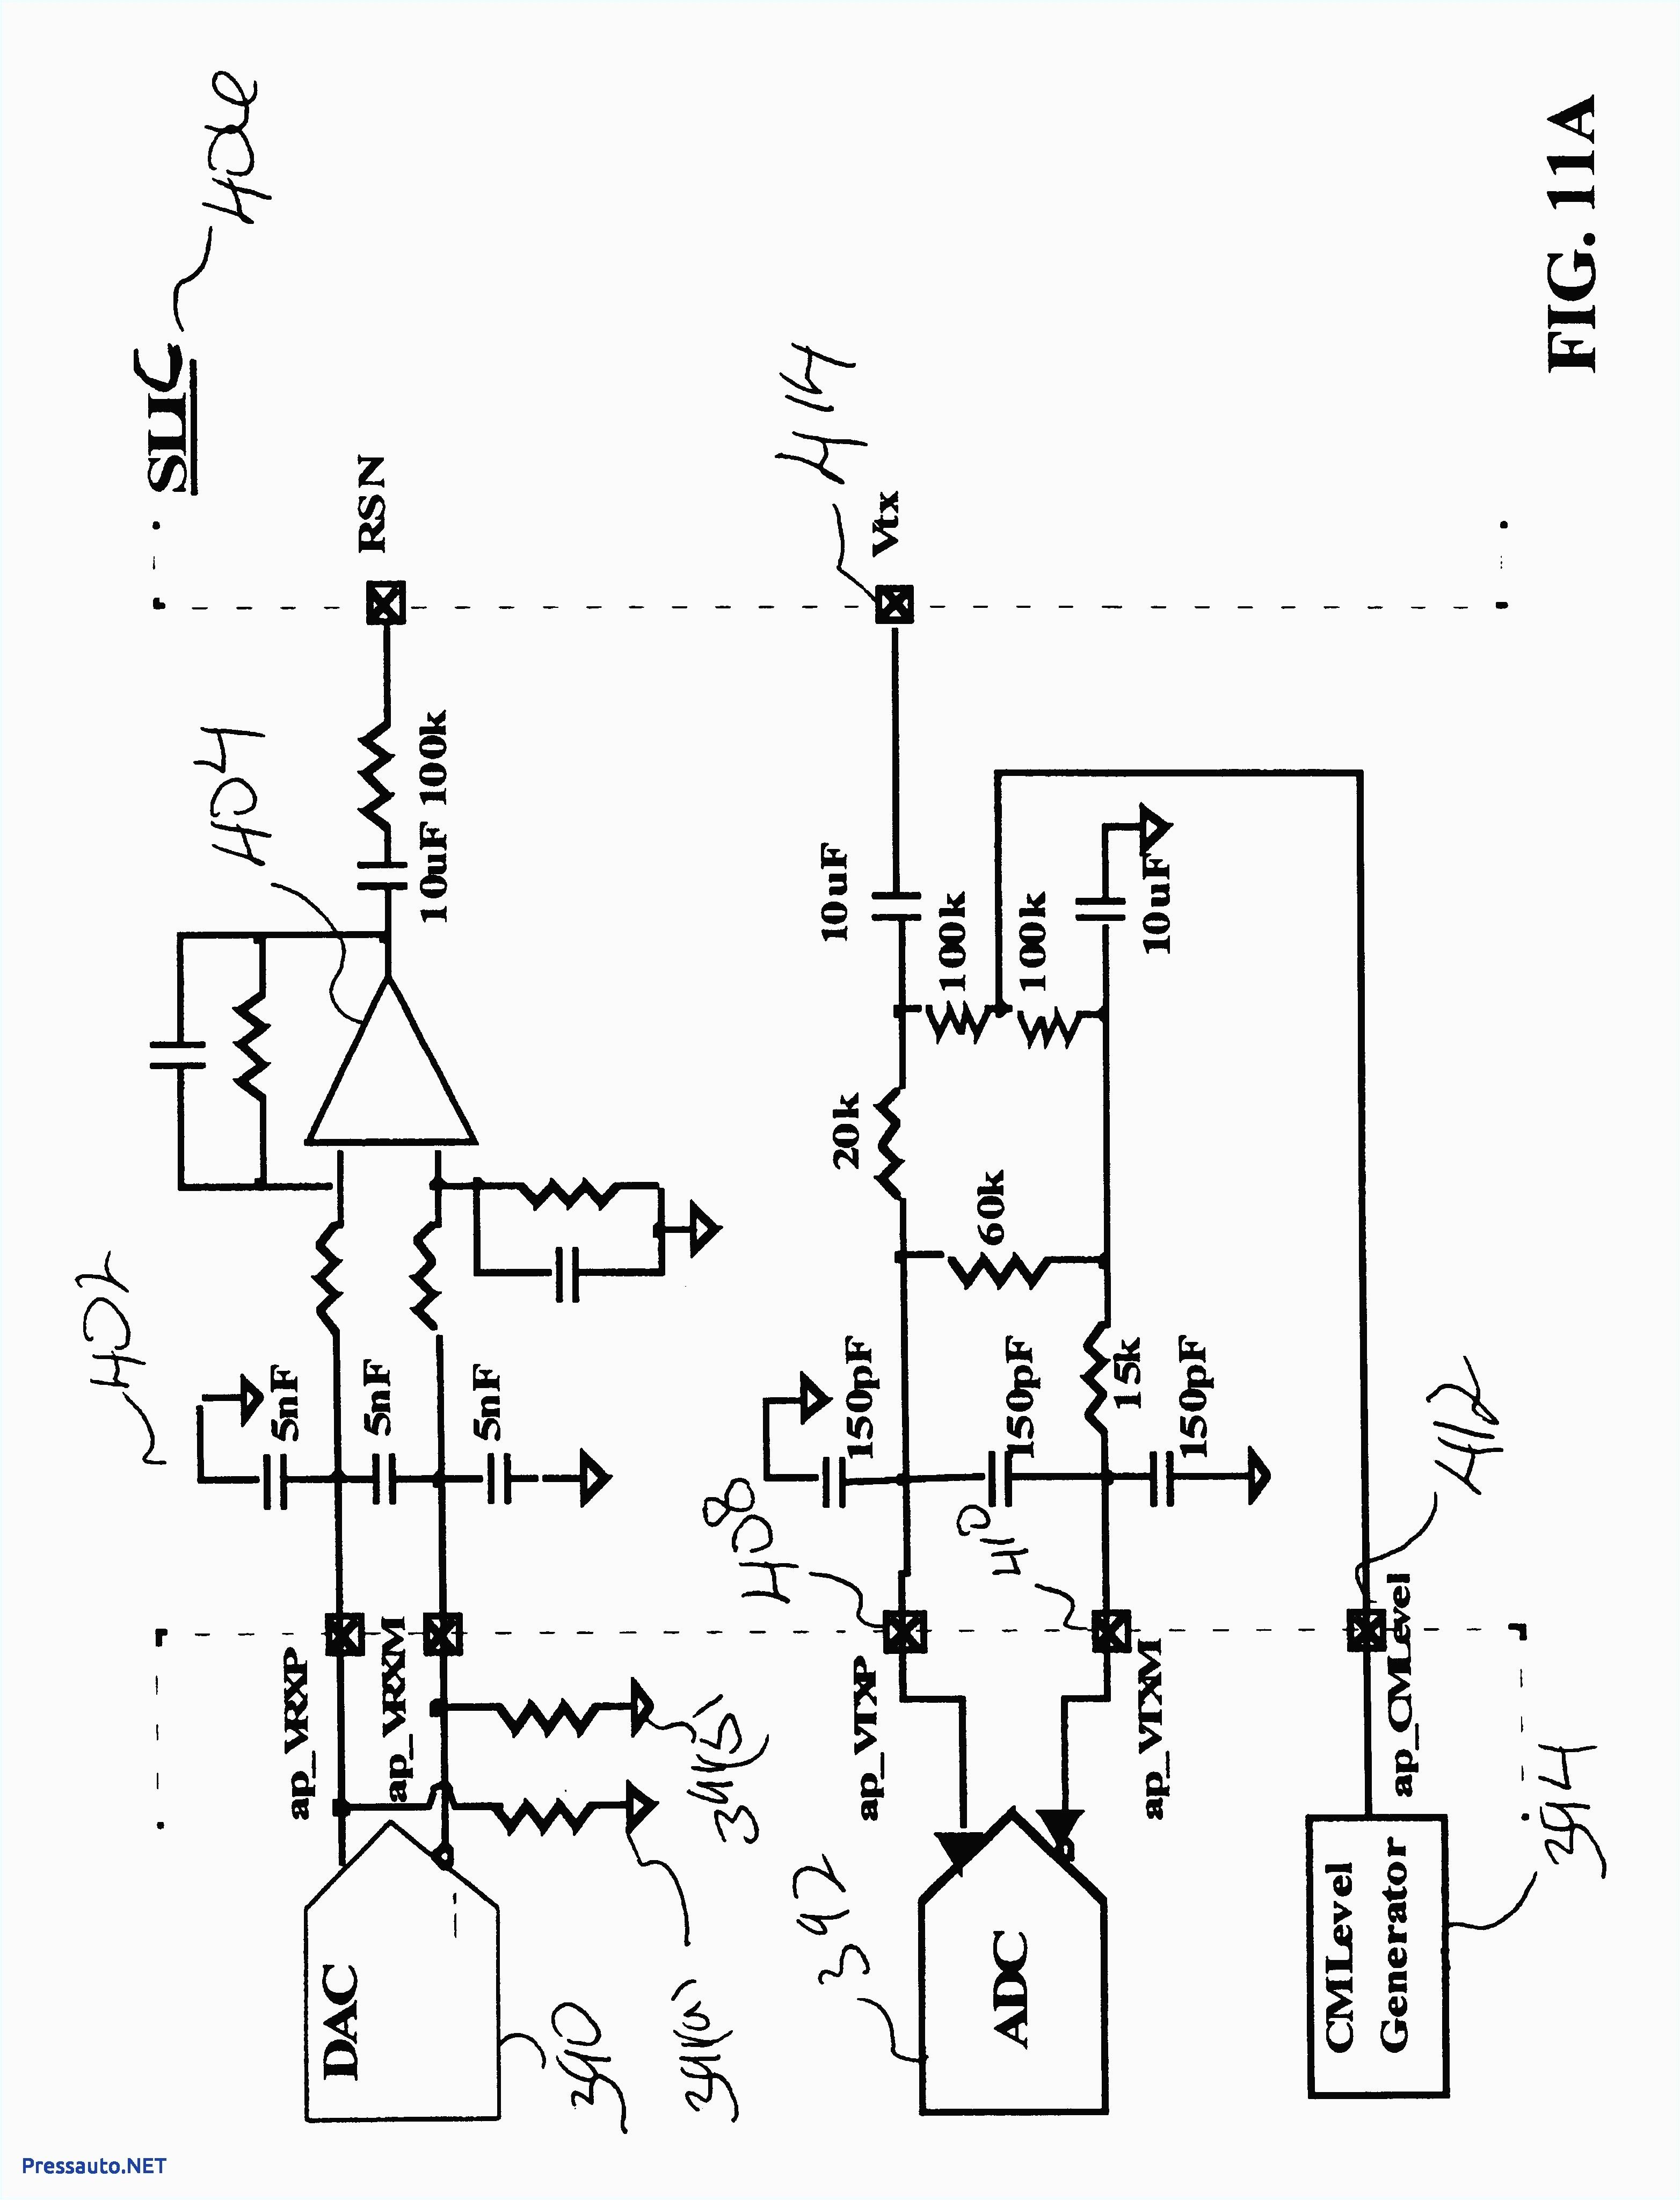 transformer connection diagrams wiring diagram databaseacme transformer t 1 wiring diagram